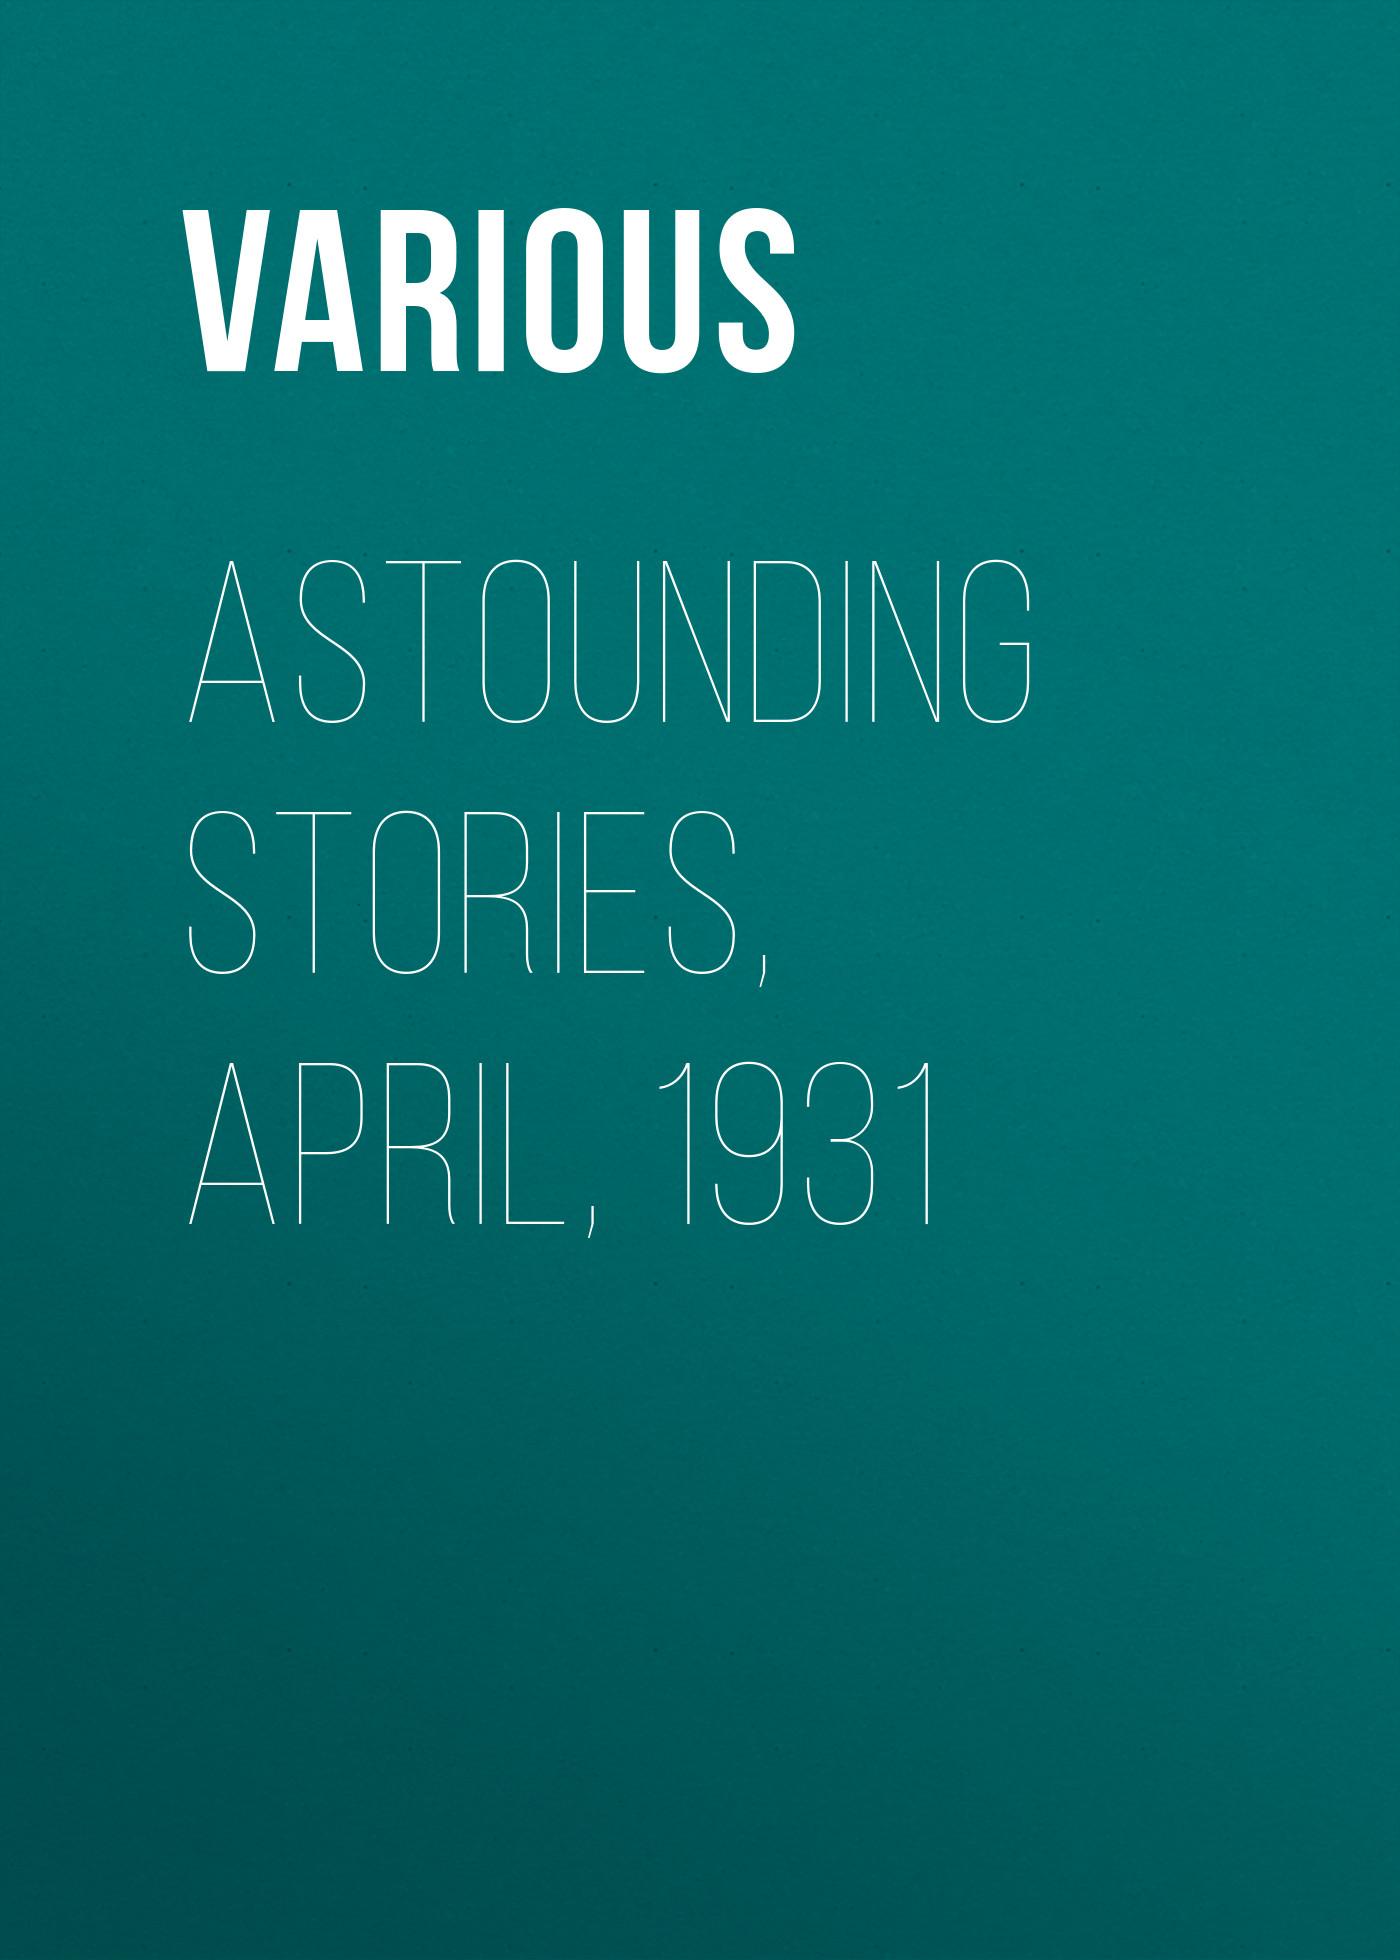 Various Astounding Stories, April, 1931 vitaly mushkin erotic stories top ten